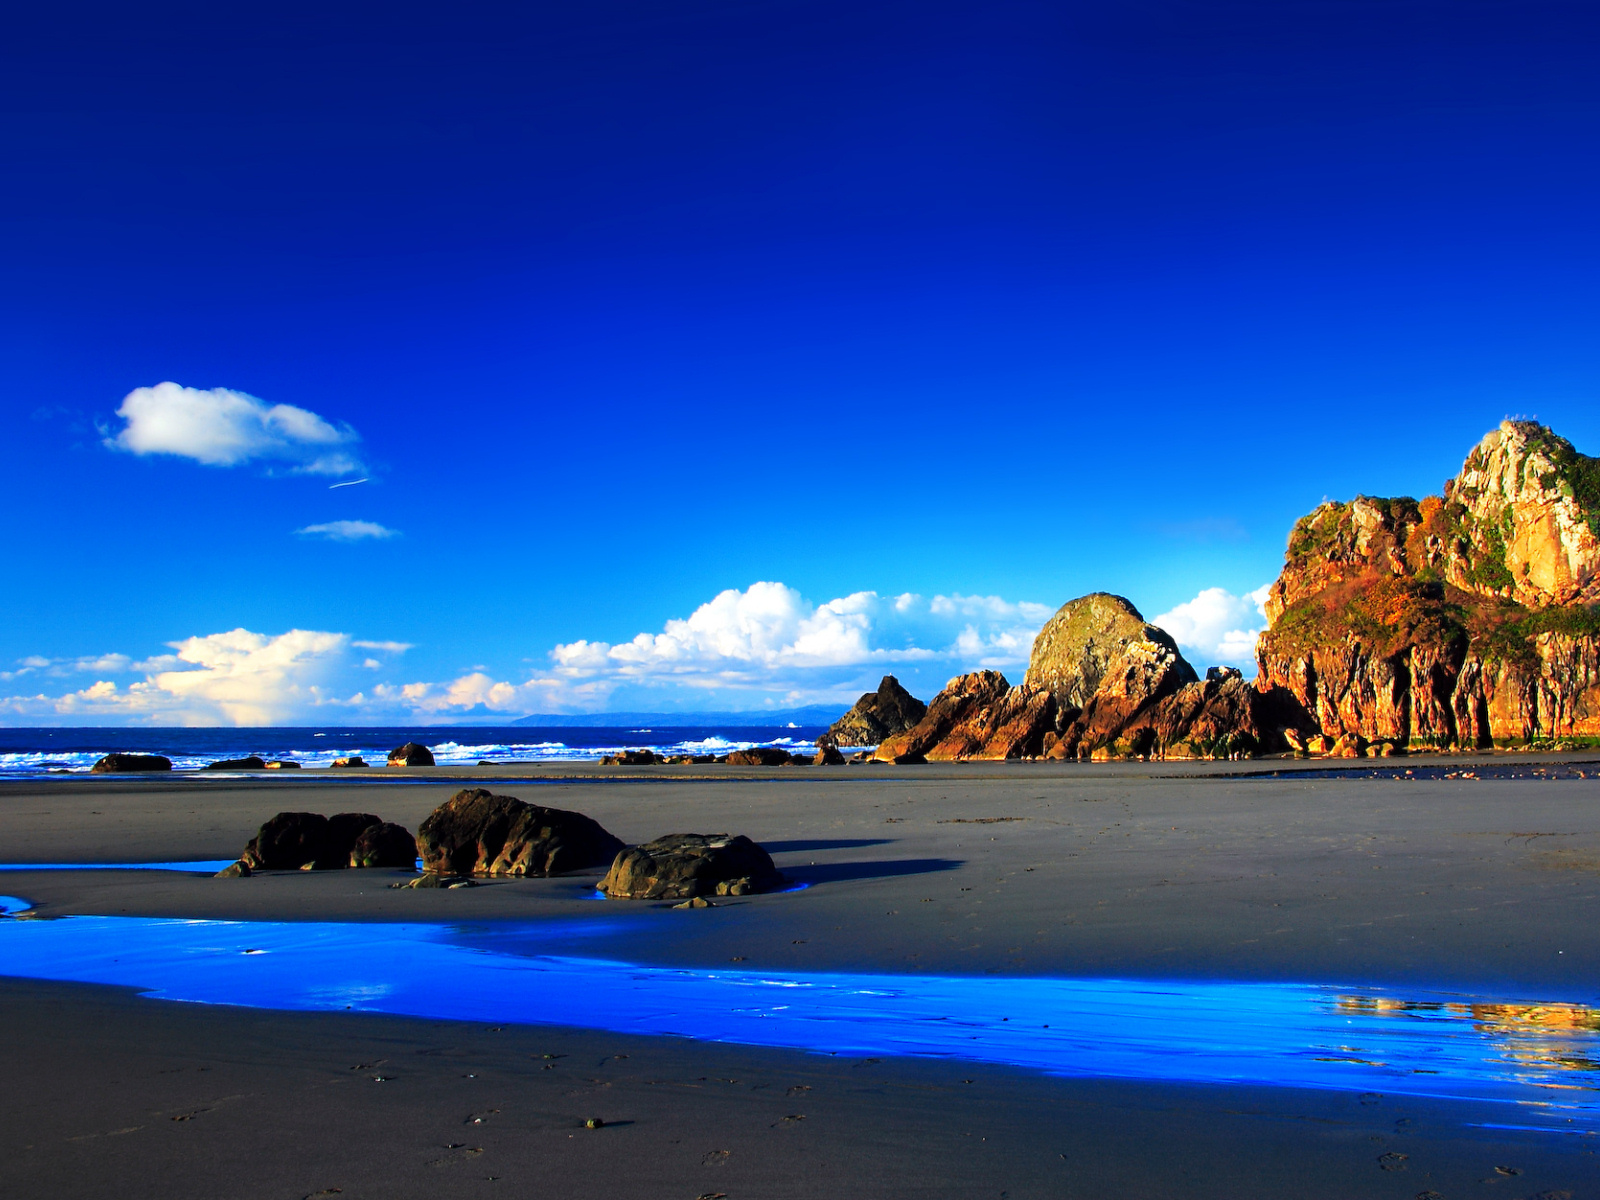 http://3.bp.blogspot.com/_Ze2e-t3CN_A/S-eAg0IK5bI/AAAAAAAAI2Y/X7bpH_AbrAc/s1600/deep-blue-sky-wallpapers_8796_1600x1200.jpg